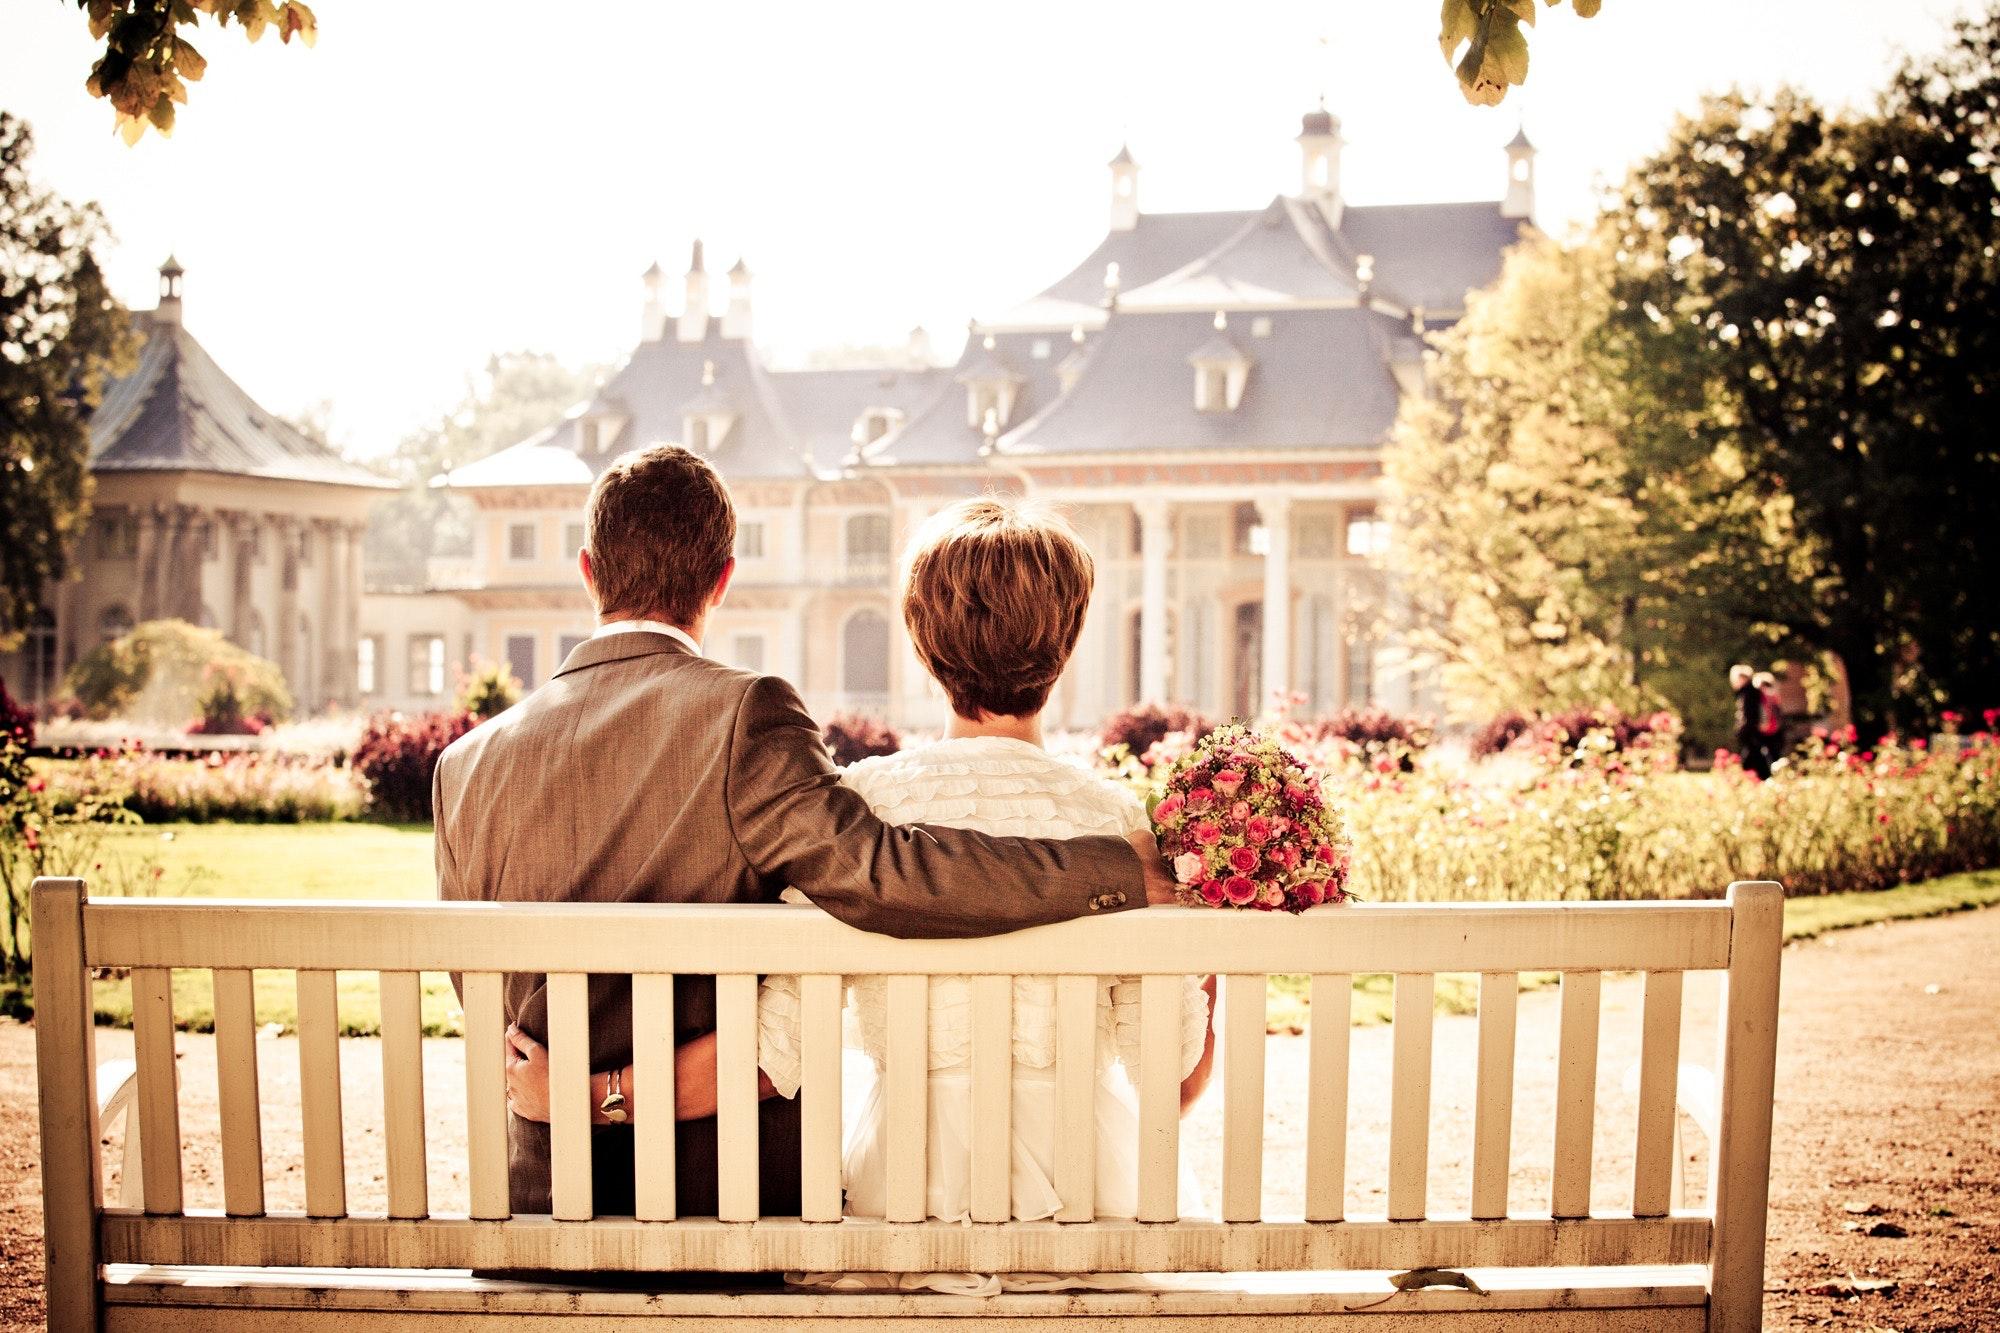 couple-bride-love-wedding-60559.jpeg